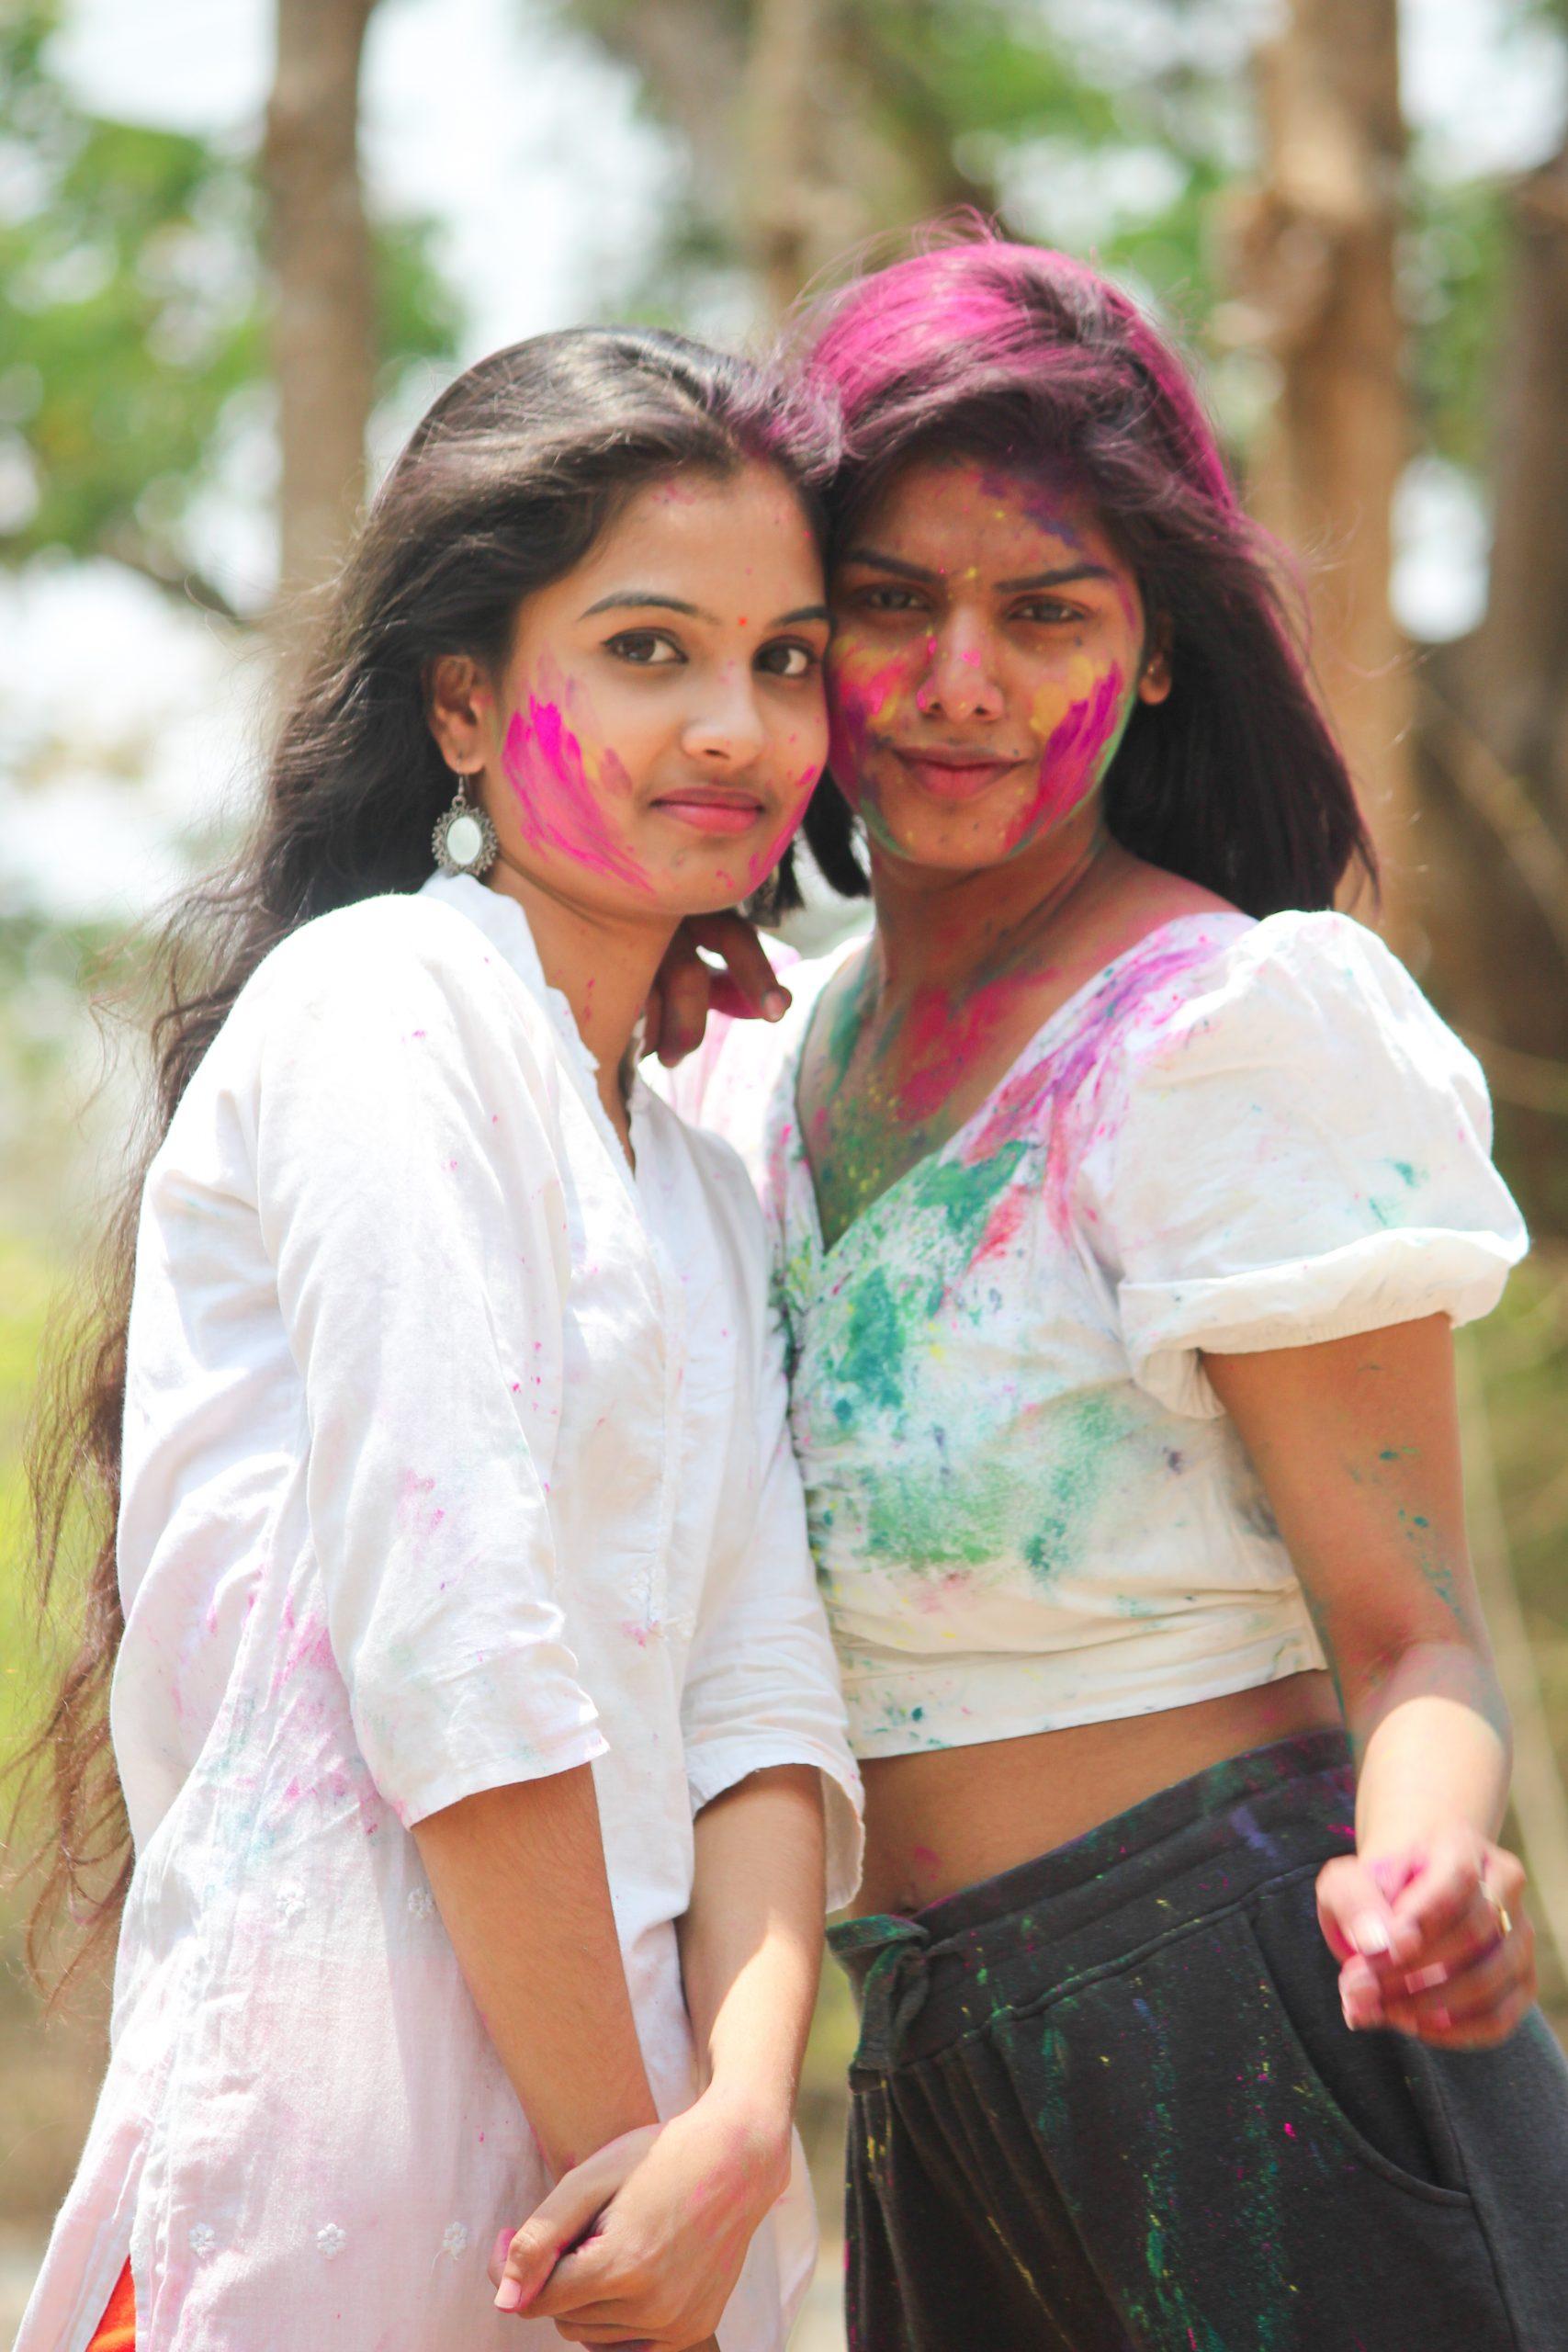 Girls celebrating Holi festival